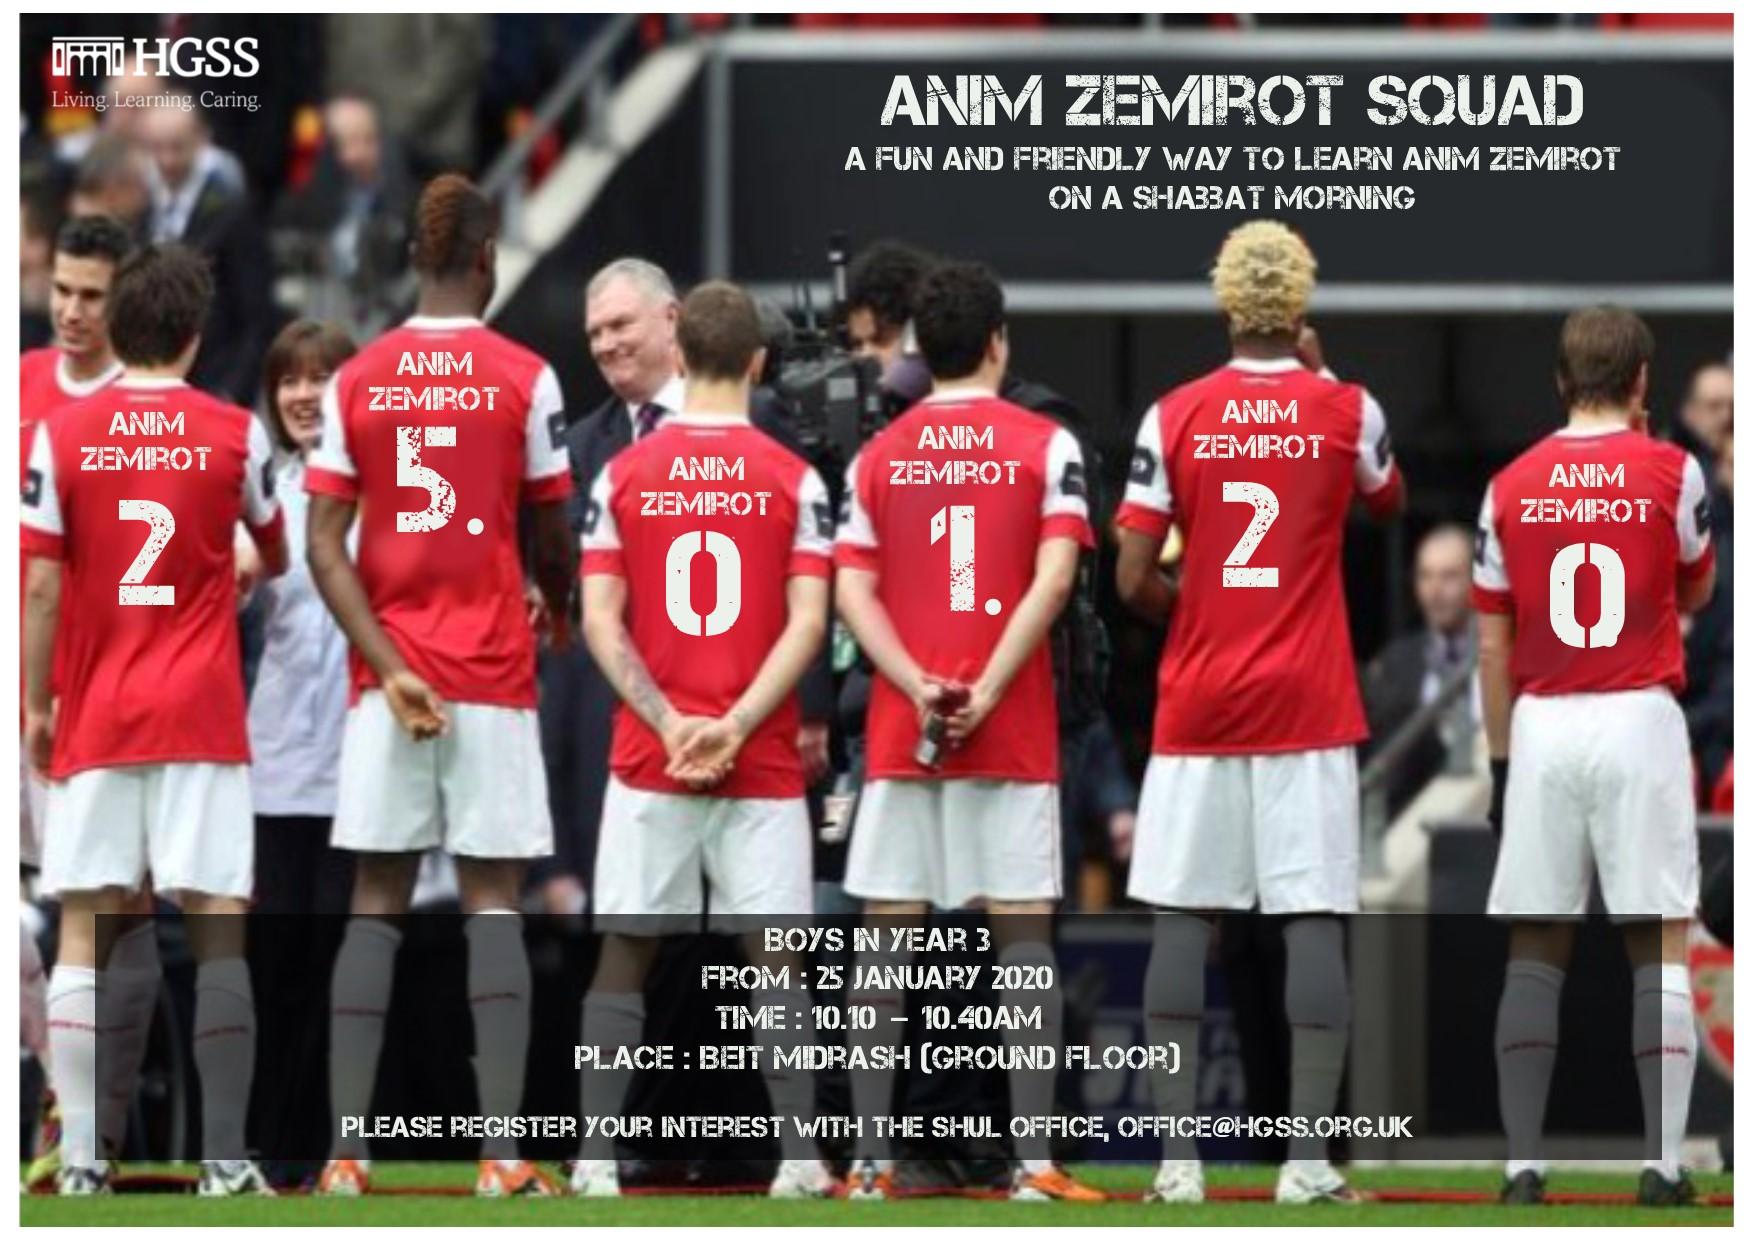 Anim Zemirot Squad @ Beit Midrash (ground floor)